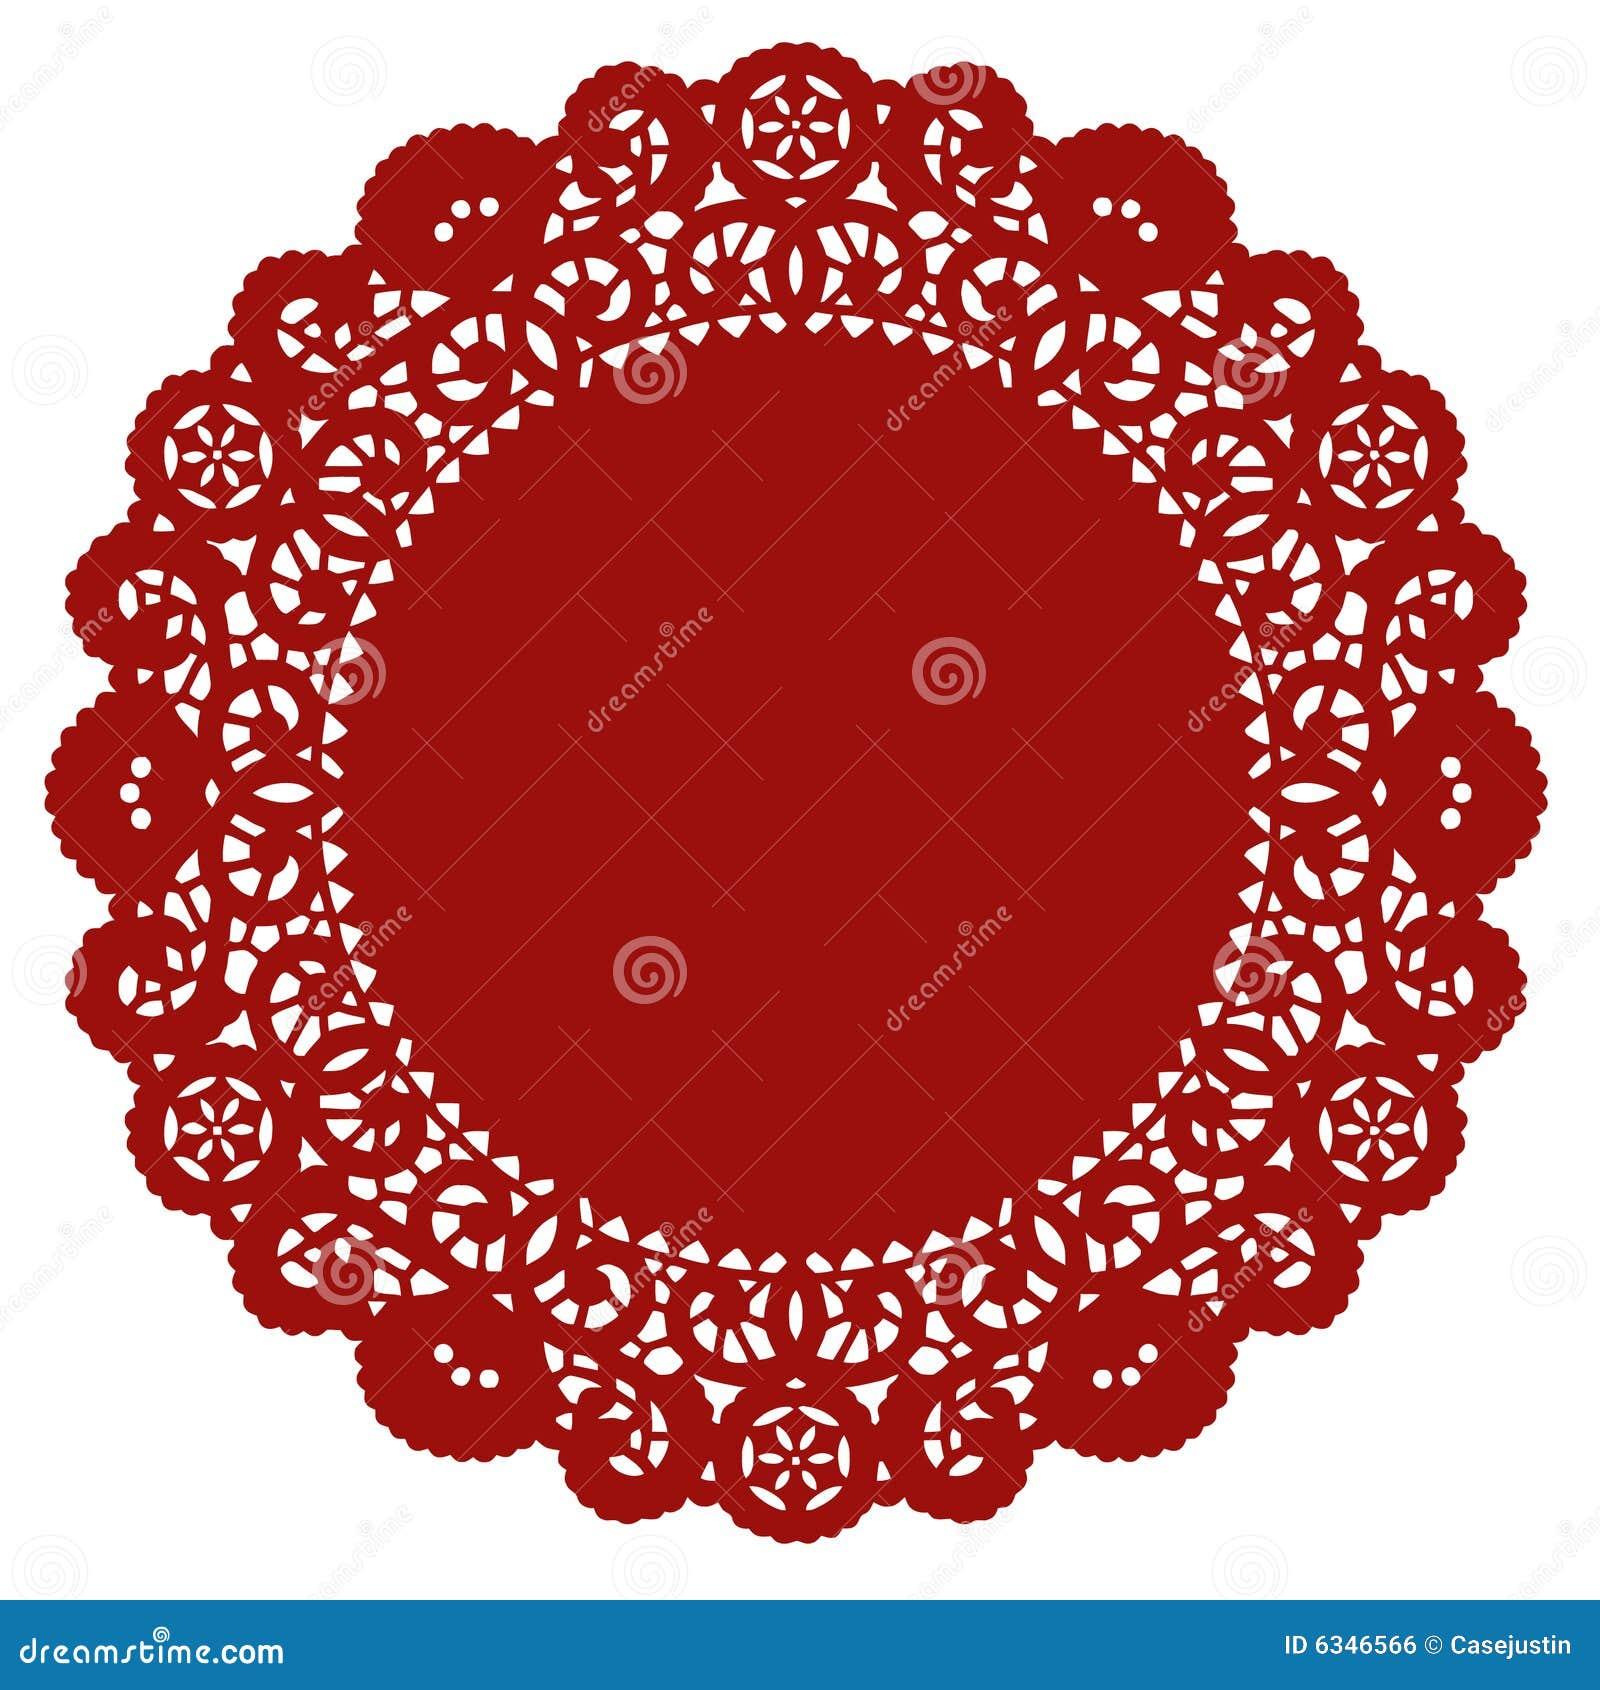 Crimson doily lace round